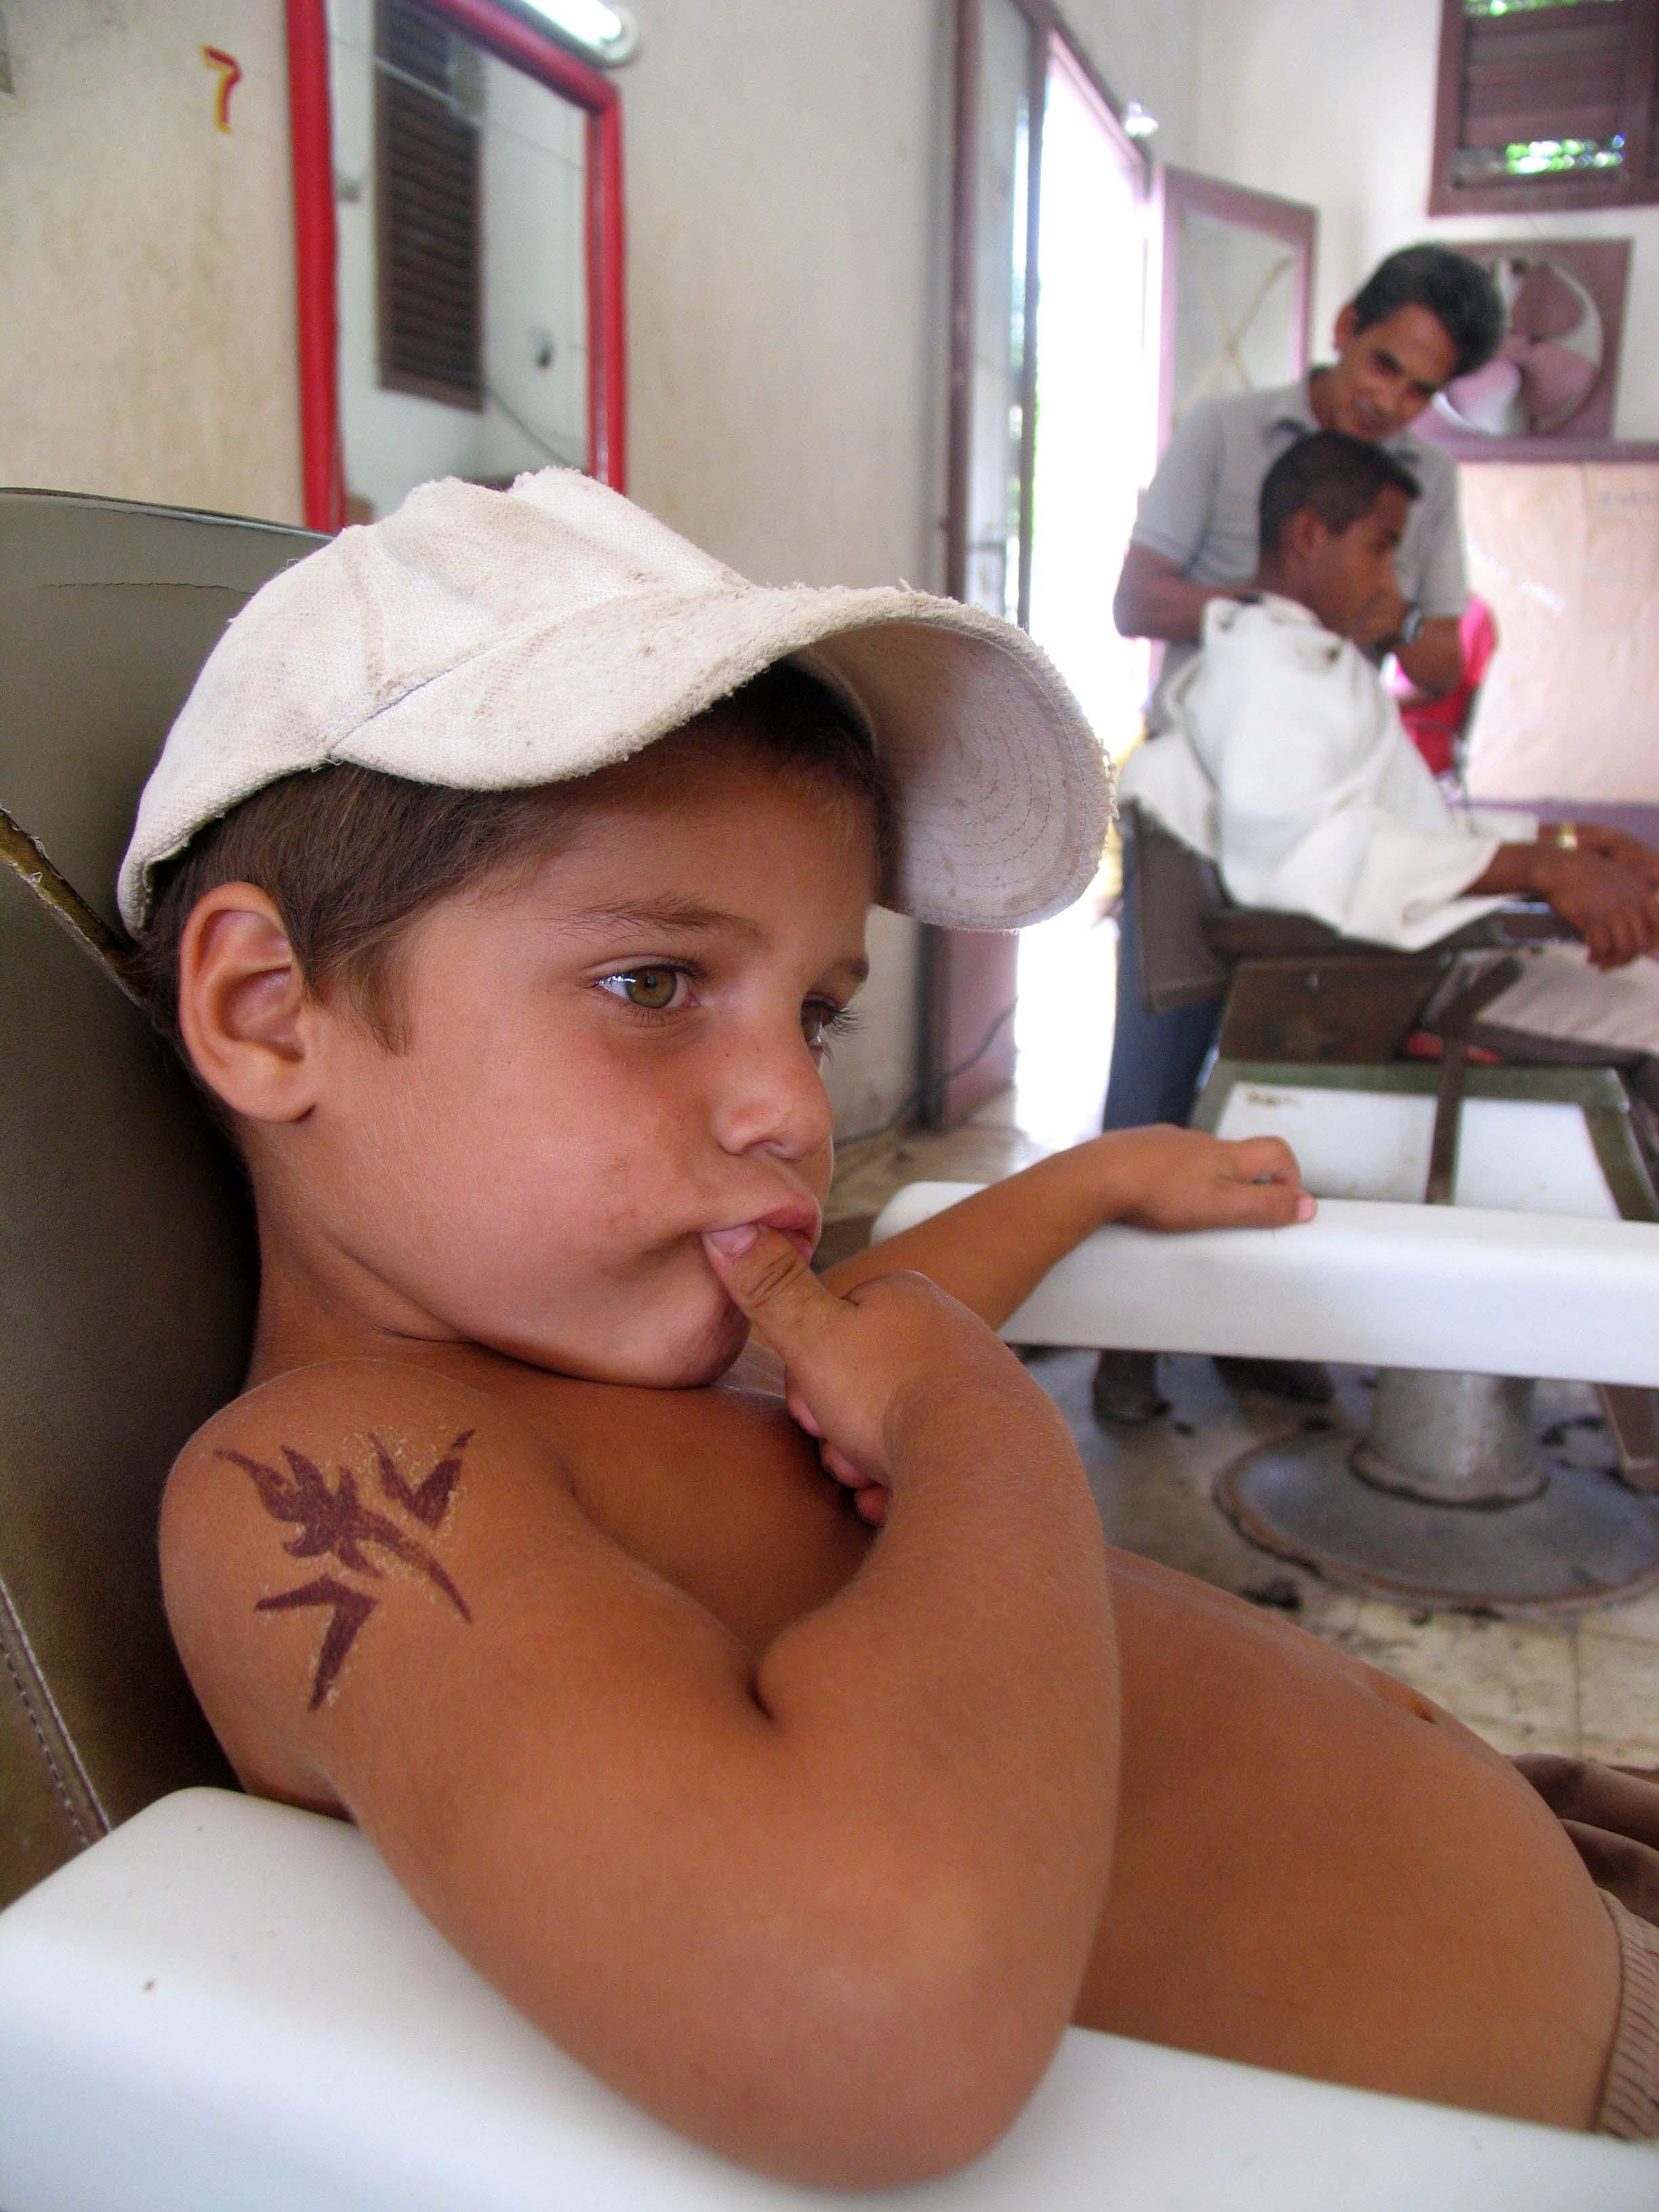 Waiting for a trim, Cuba